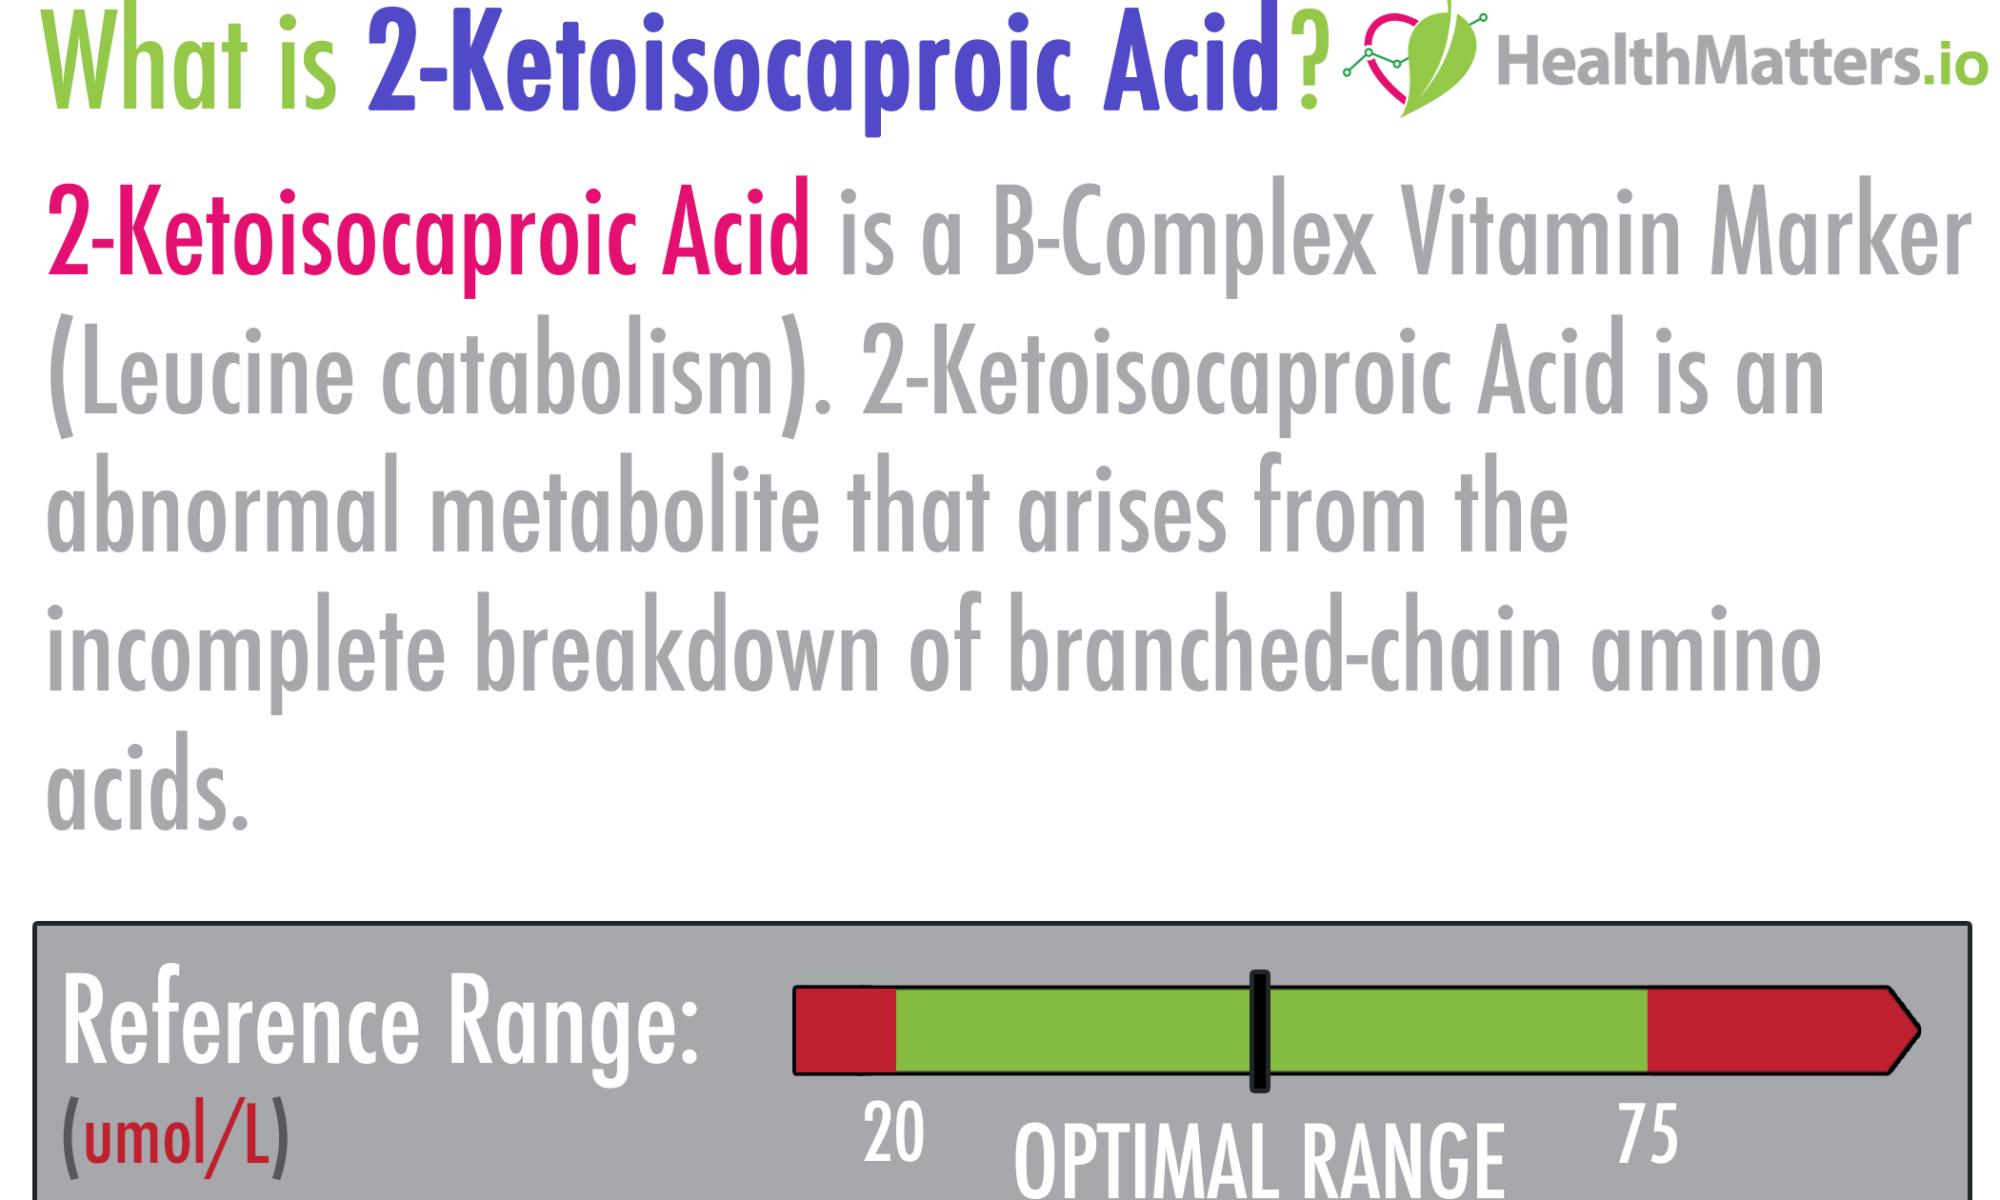 2-Ketoisocaproic Acid high low meaning treatment lab results organic acids gdx genova pdf healthmatters.io